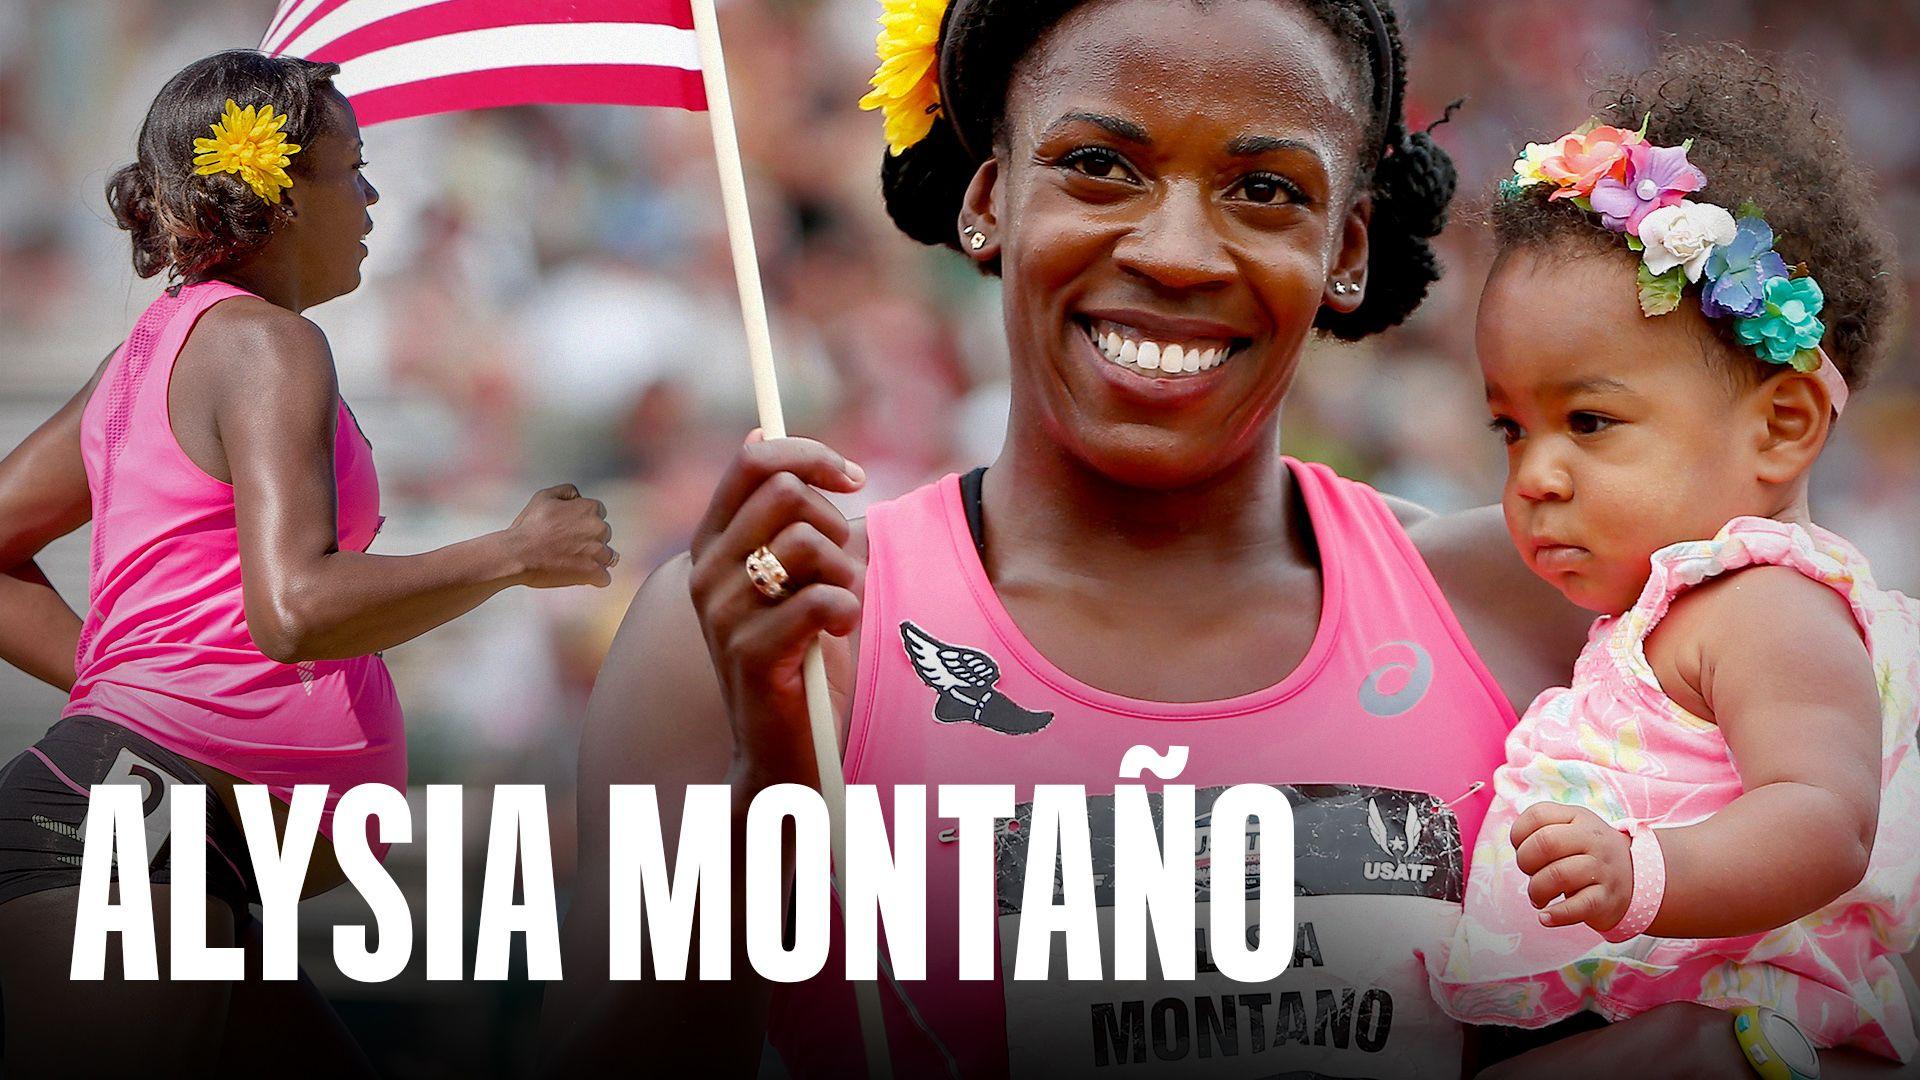 Alysia Montaño Is the Hero of This Story